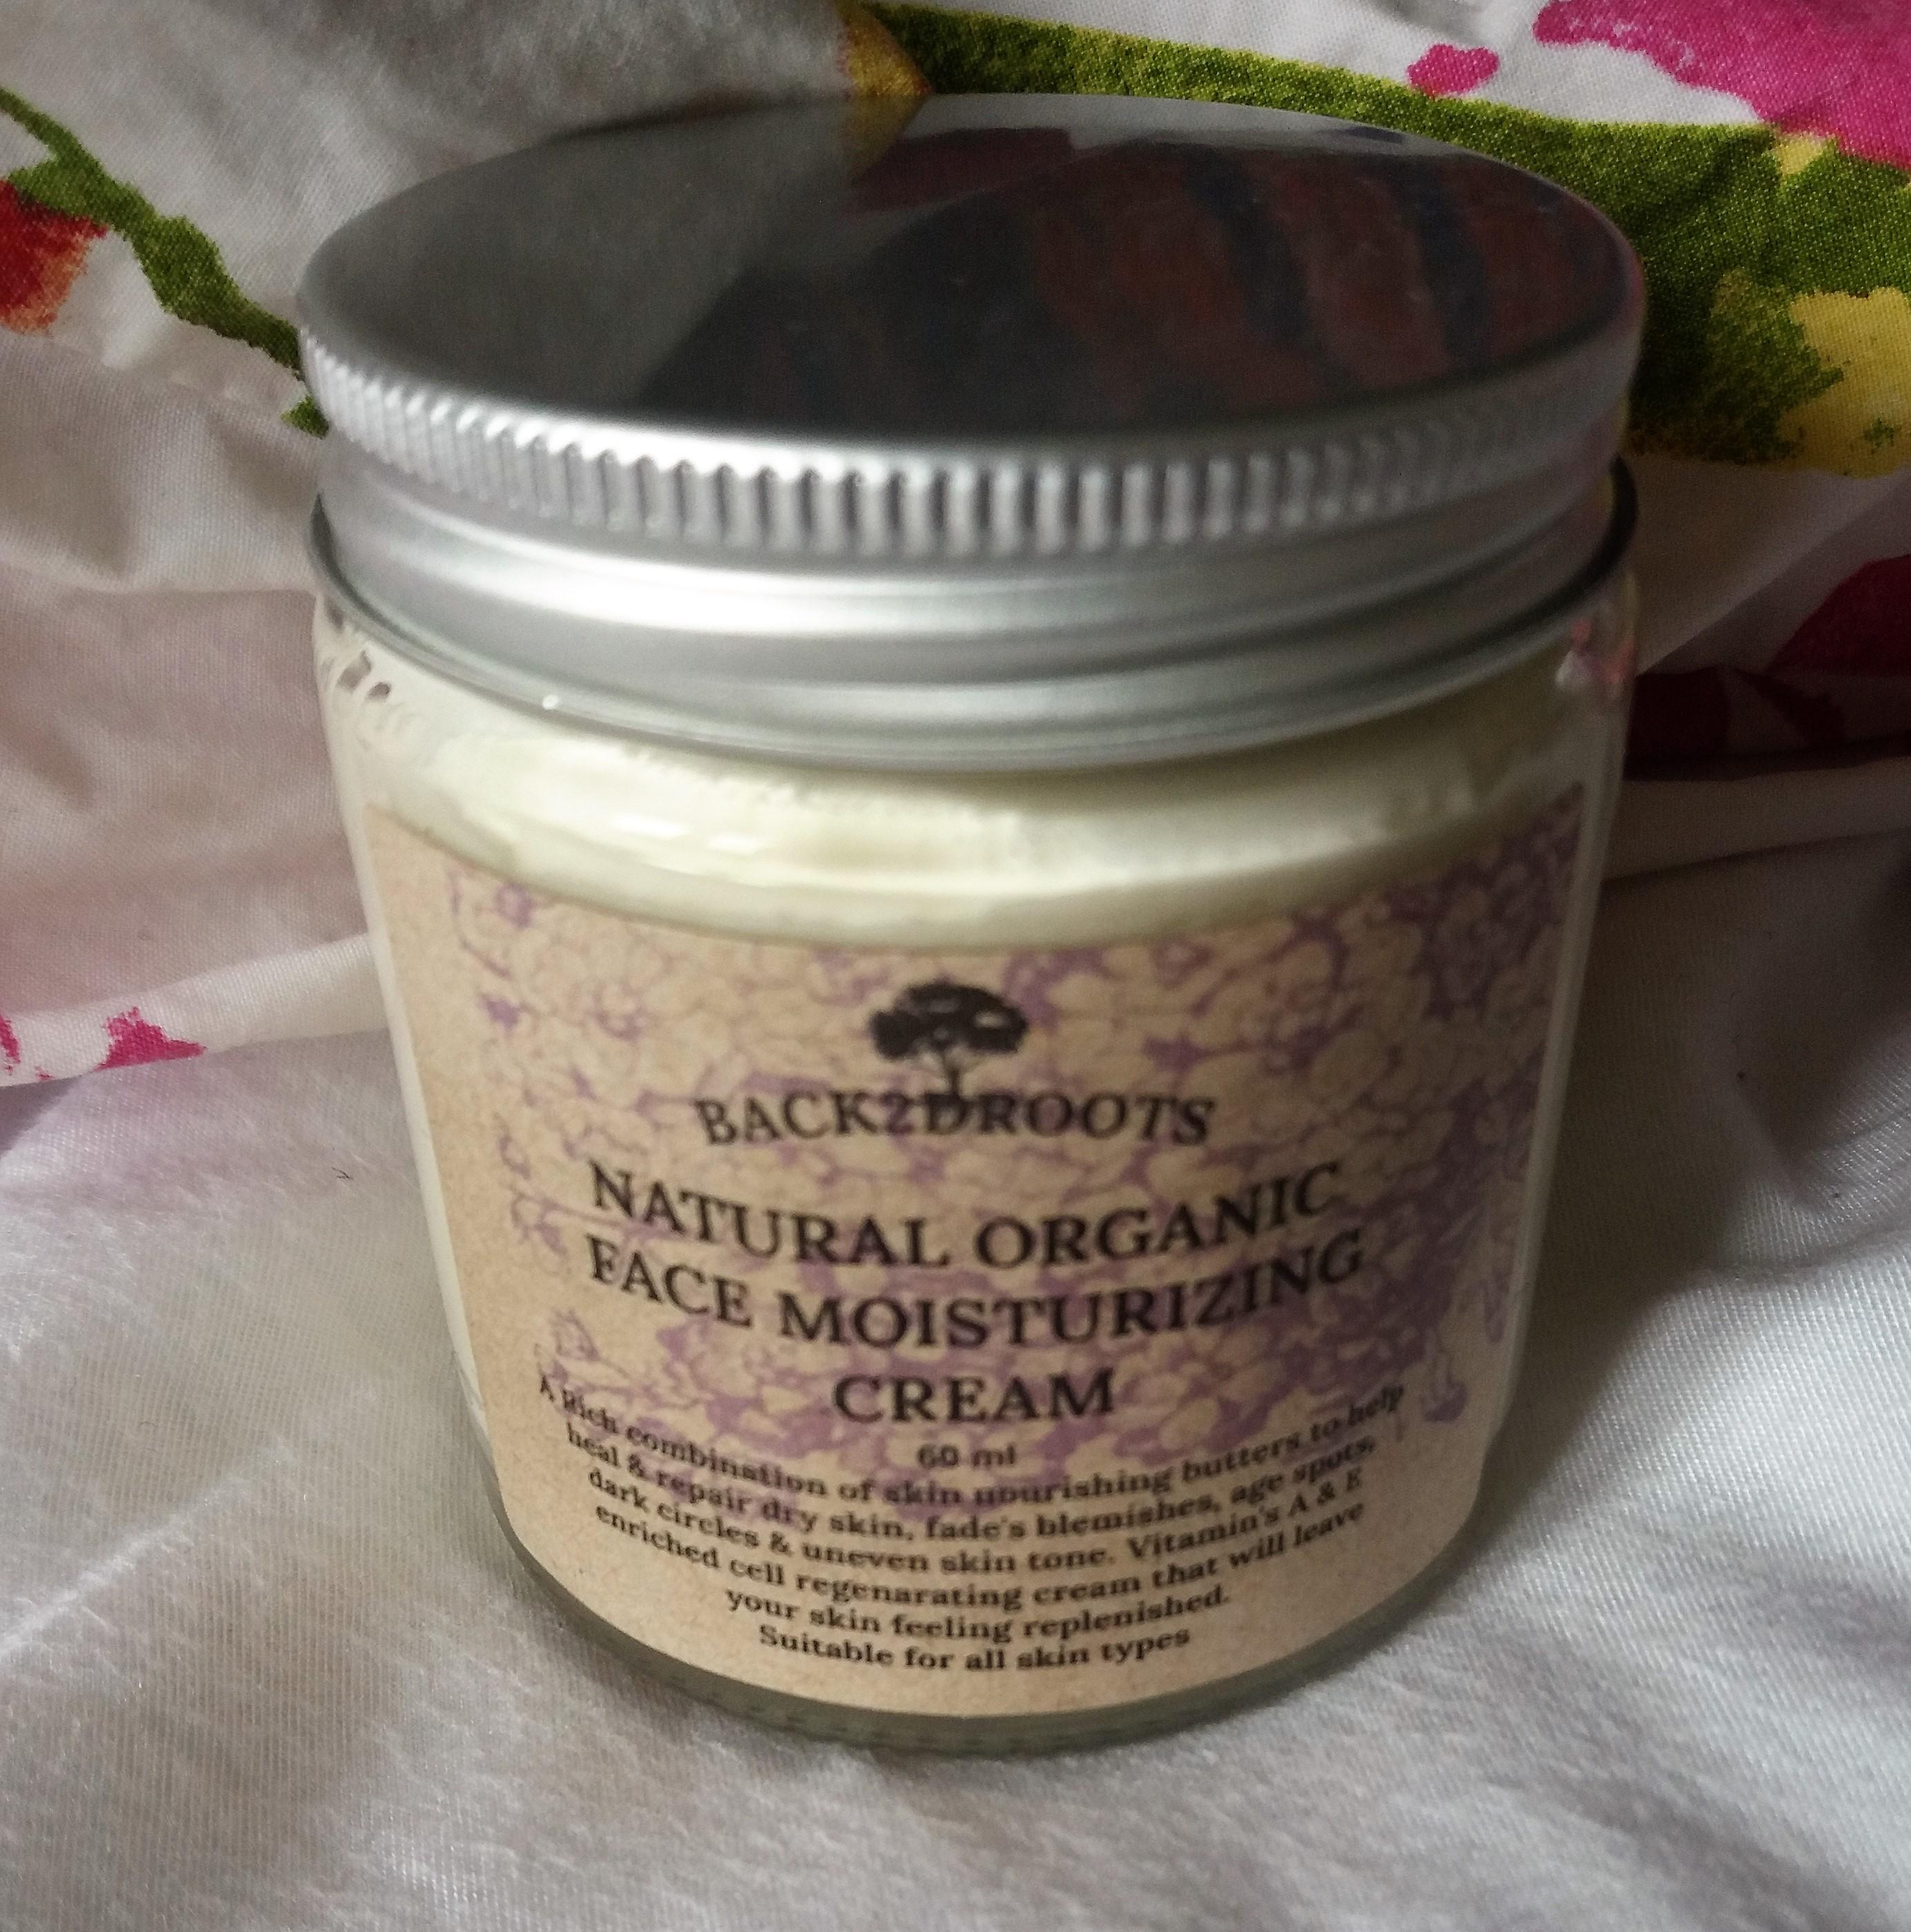 Natural Organic Face Moisturizing Cream